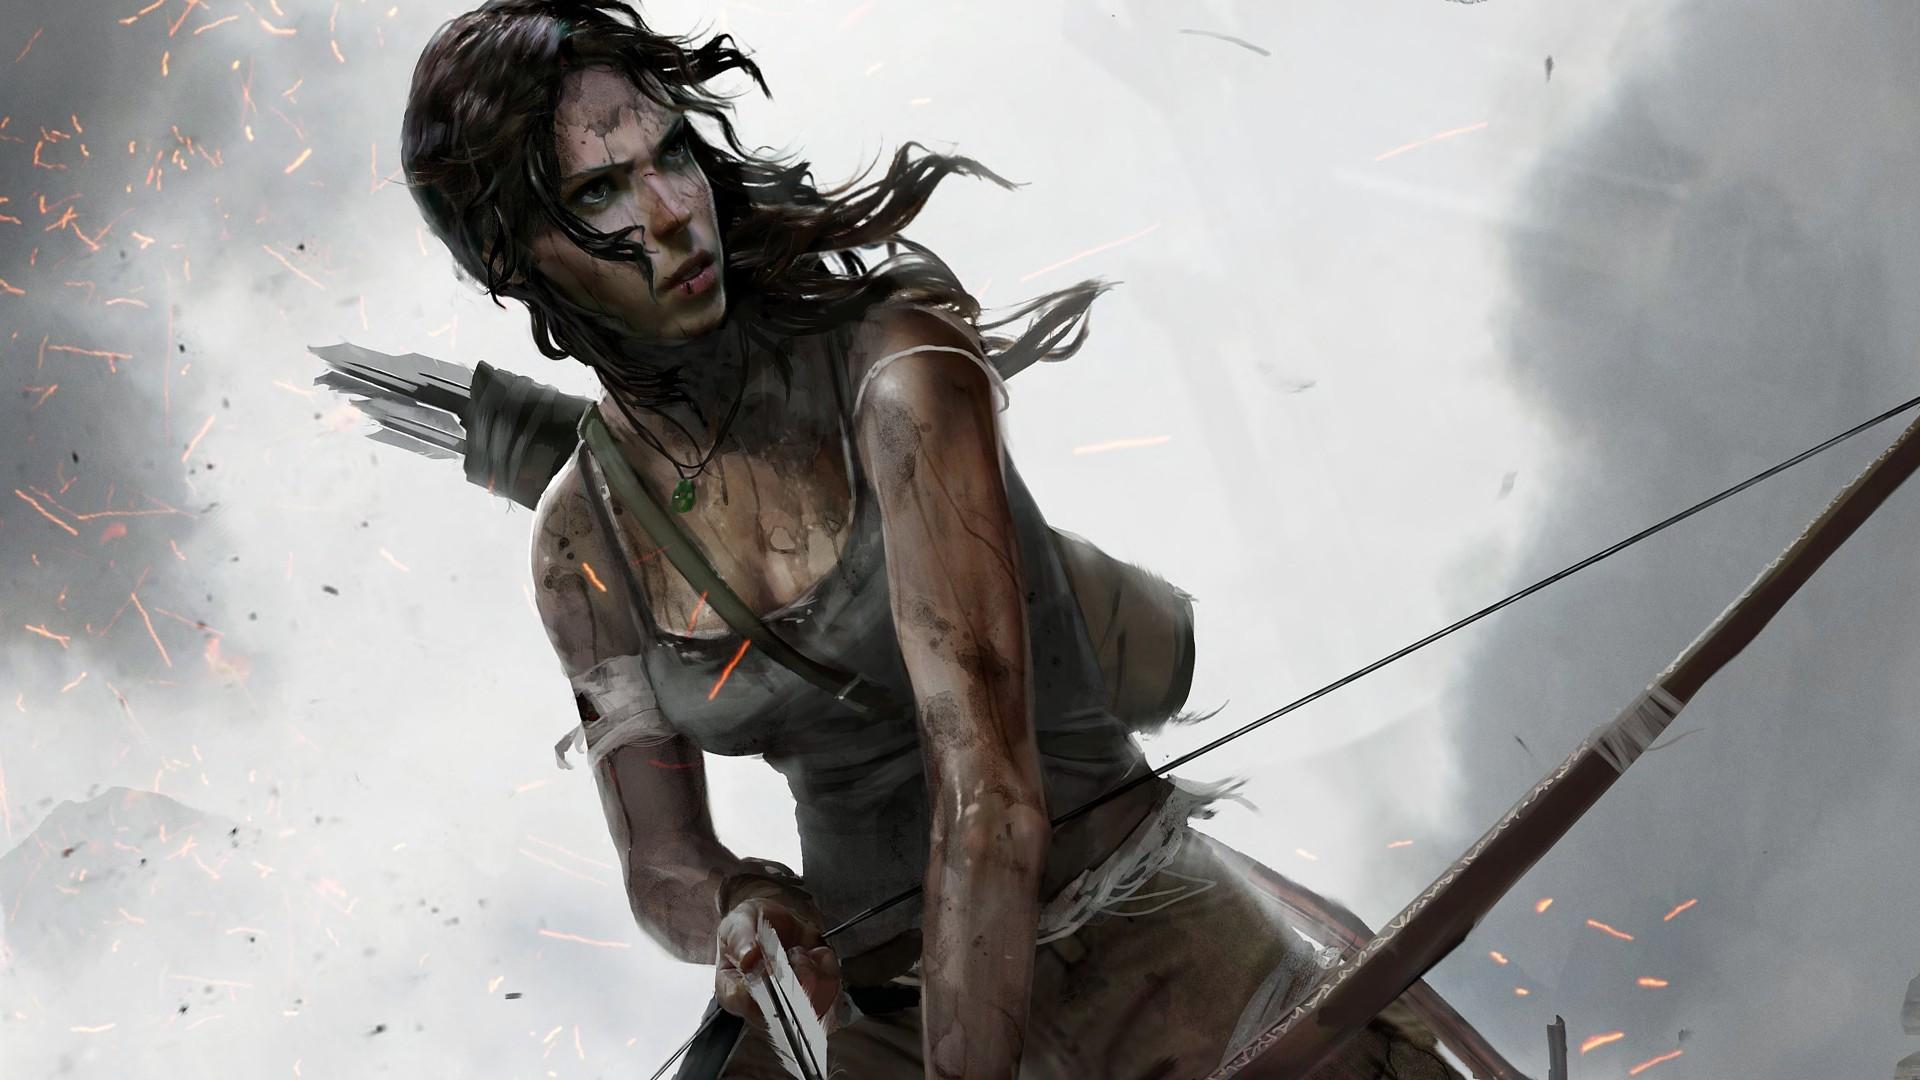 7680x4320 Lara Croft 8k Artwork 8k Hd 4k Wallpapers: Tomb Raider Definitive Edition, Lara Croft, Tomb Raider